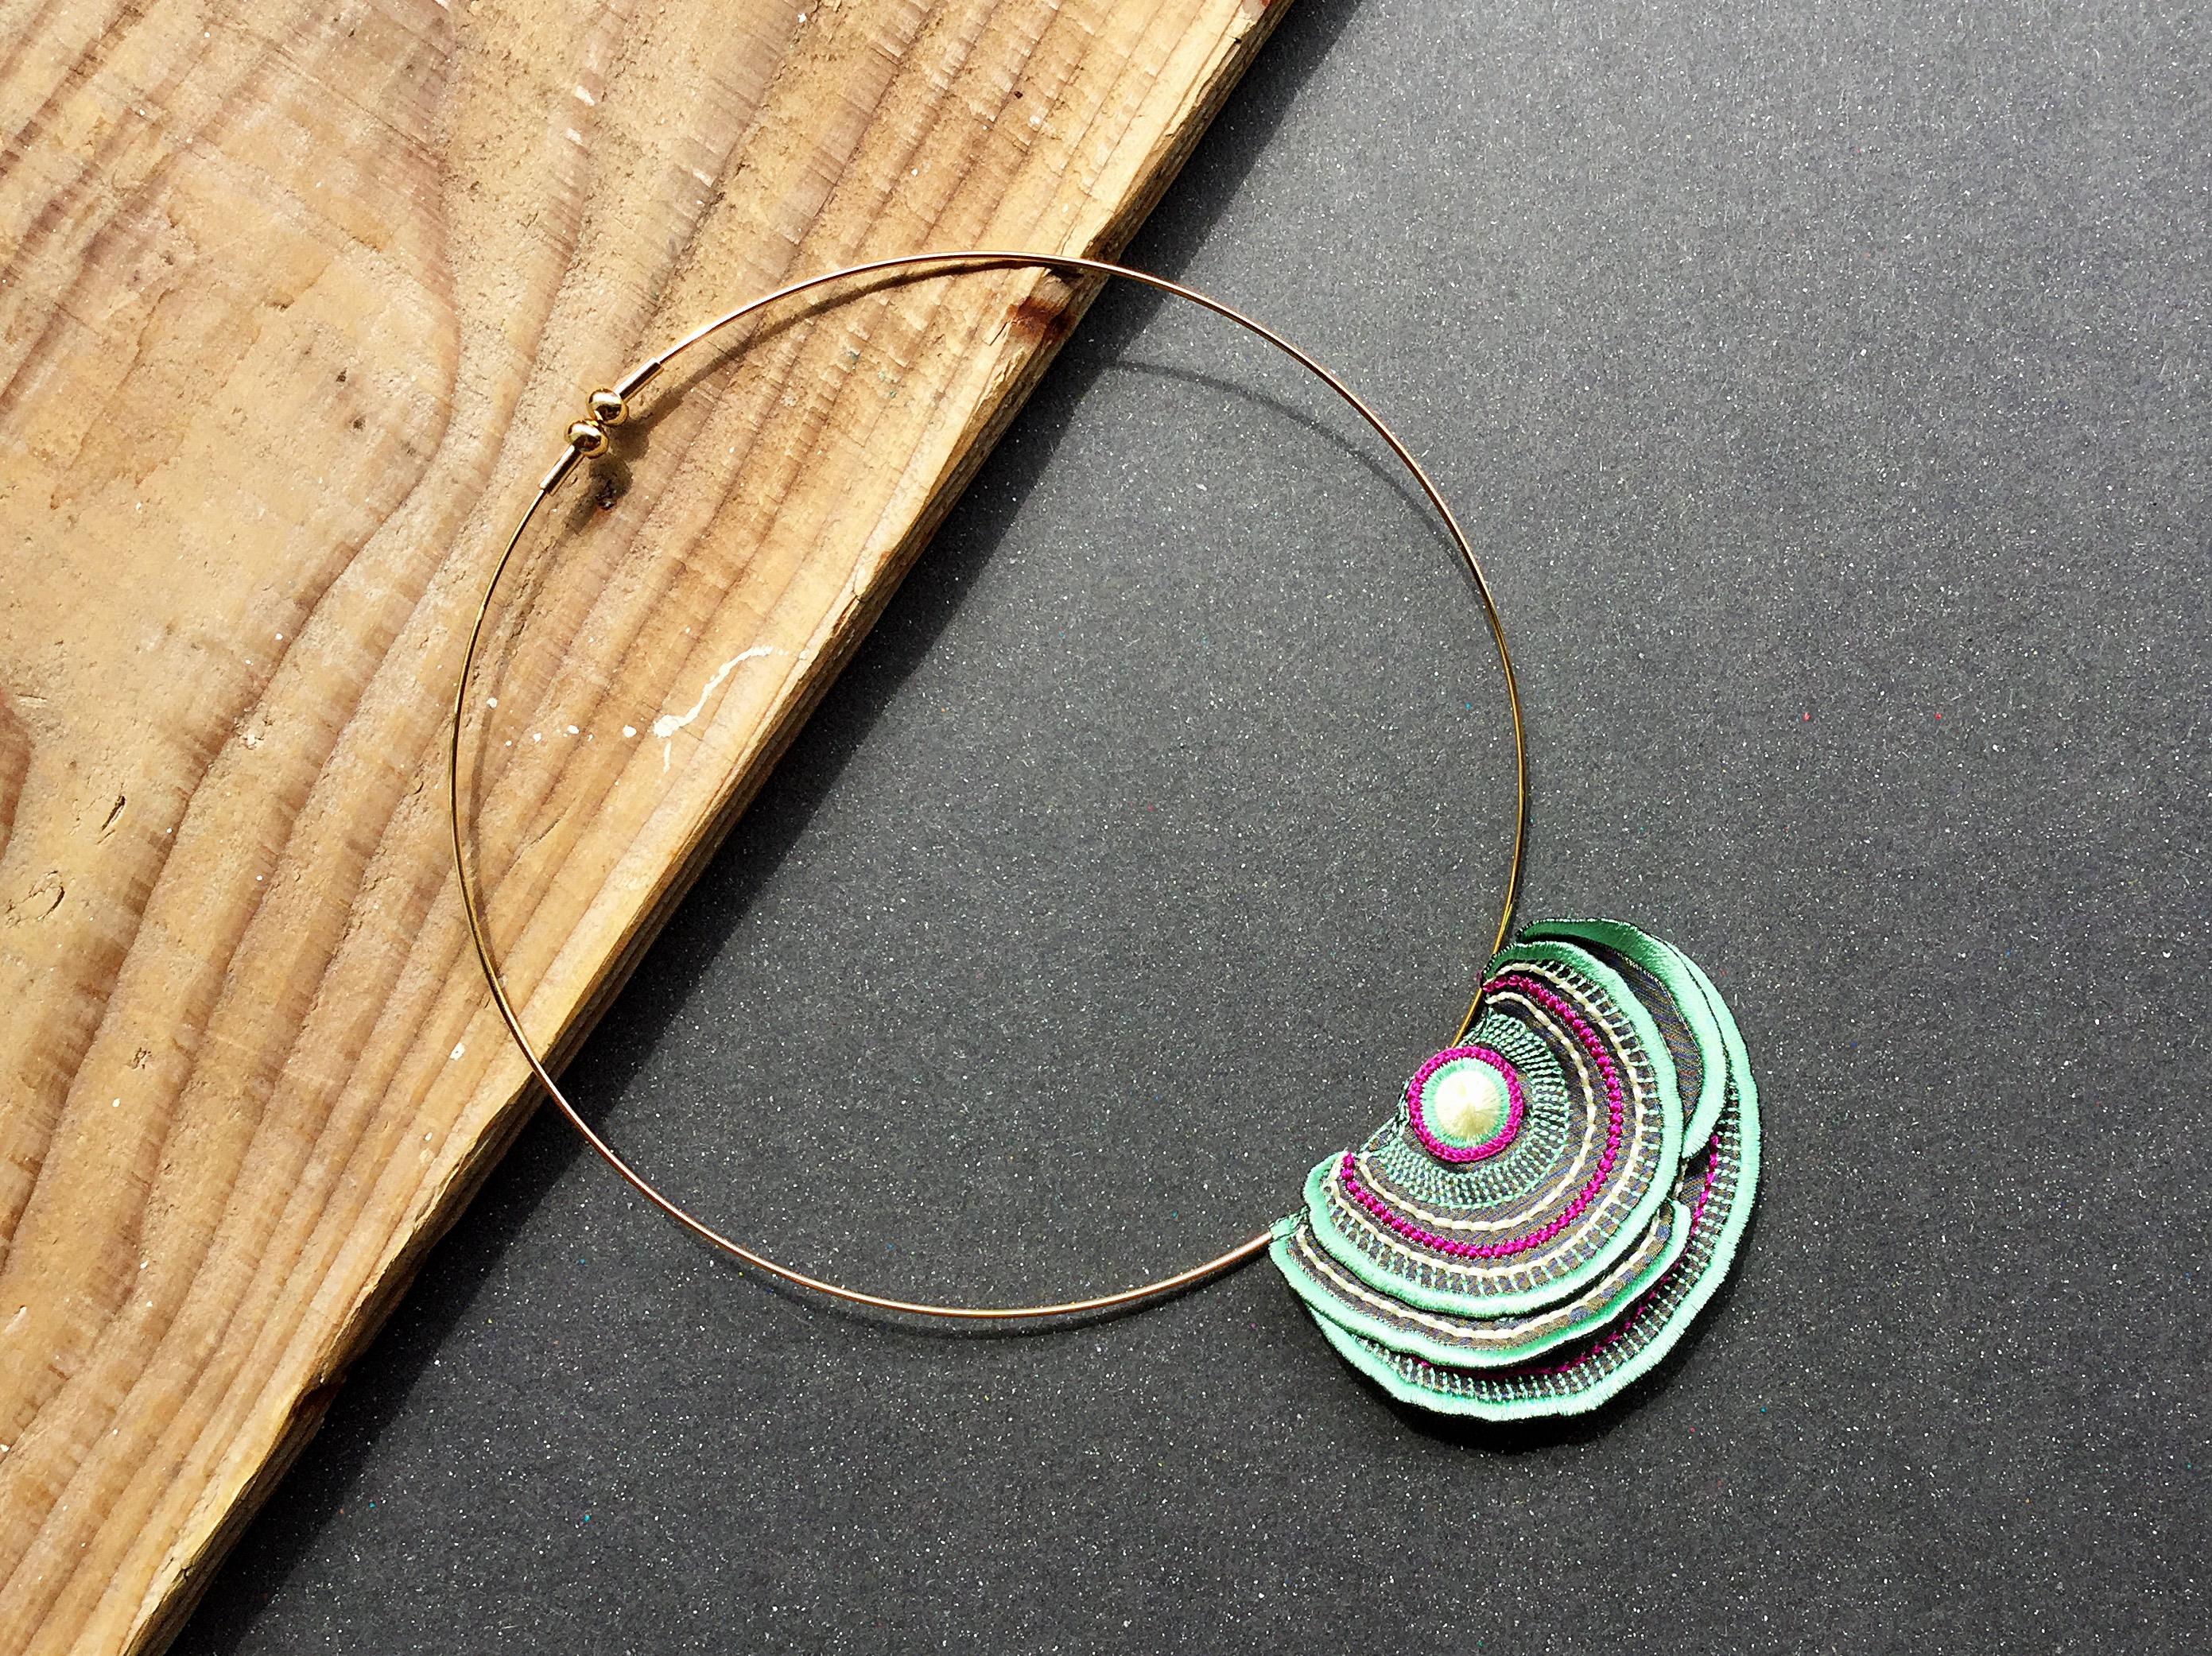 ARRO / Embroidery choker / Turkey Tail / mint green